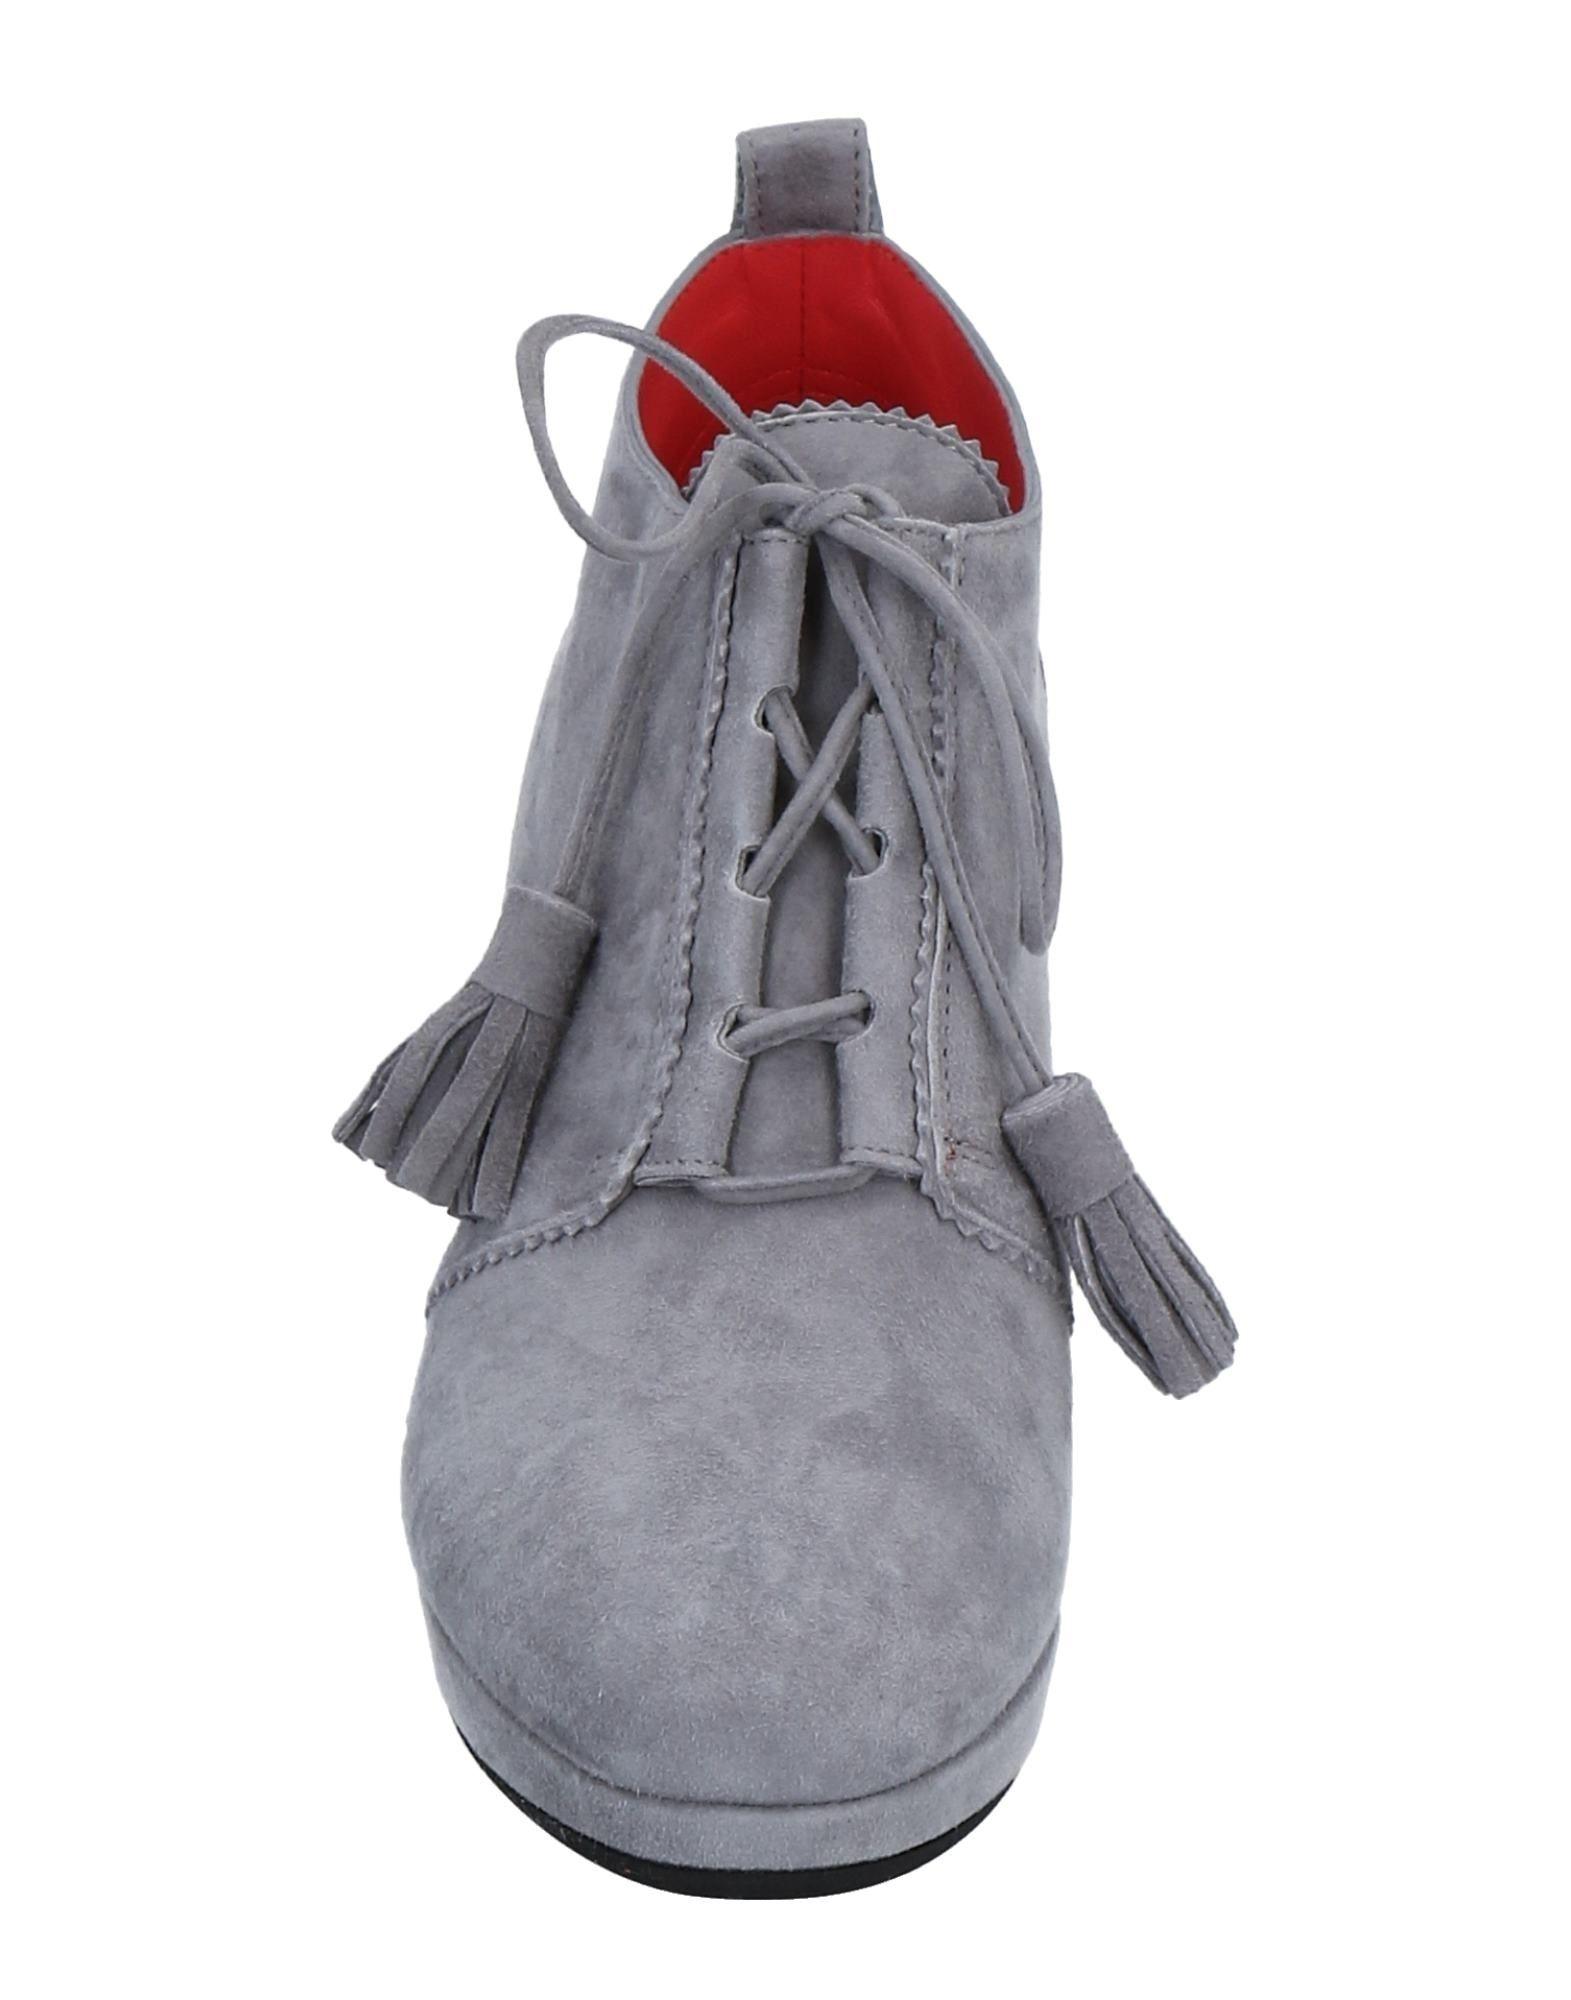 ... Pas De Rouge Stiefelette Damen Schuhe 11512856OEGut aussehende  strapazierfähige Schuhe Damen 9c0dce 081434ccbb